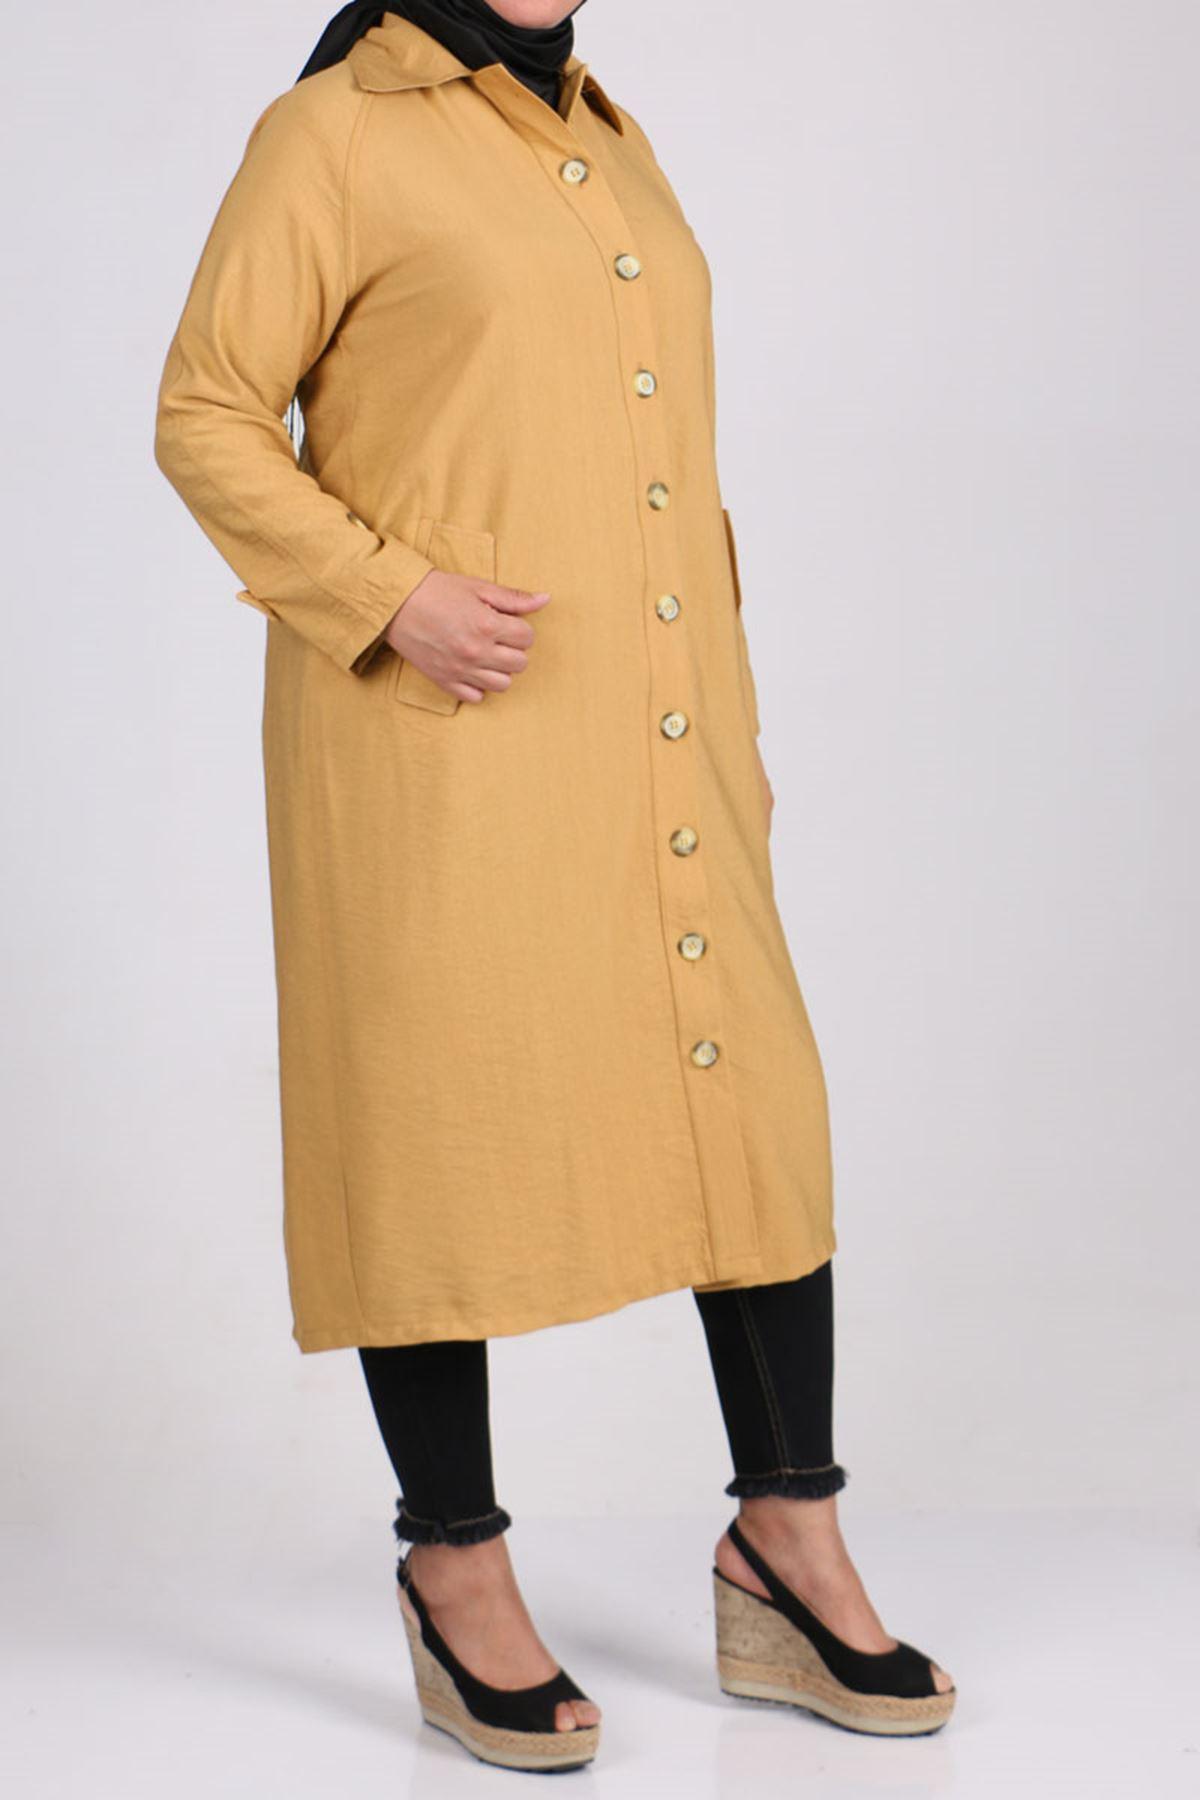 3161 معطف ترينش مقاس كبير بأزرار - زعفران